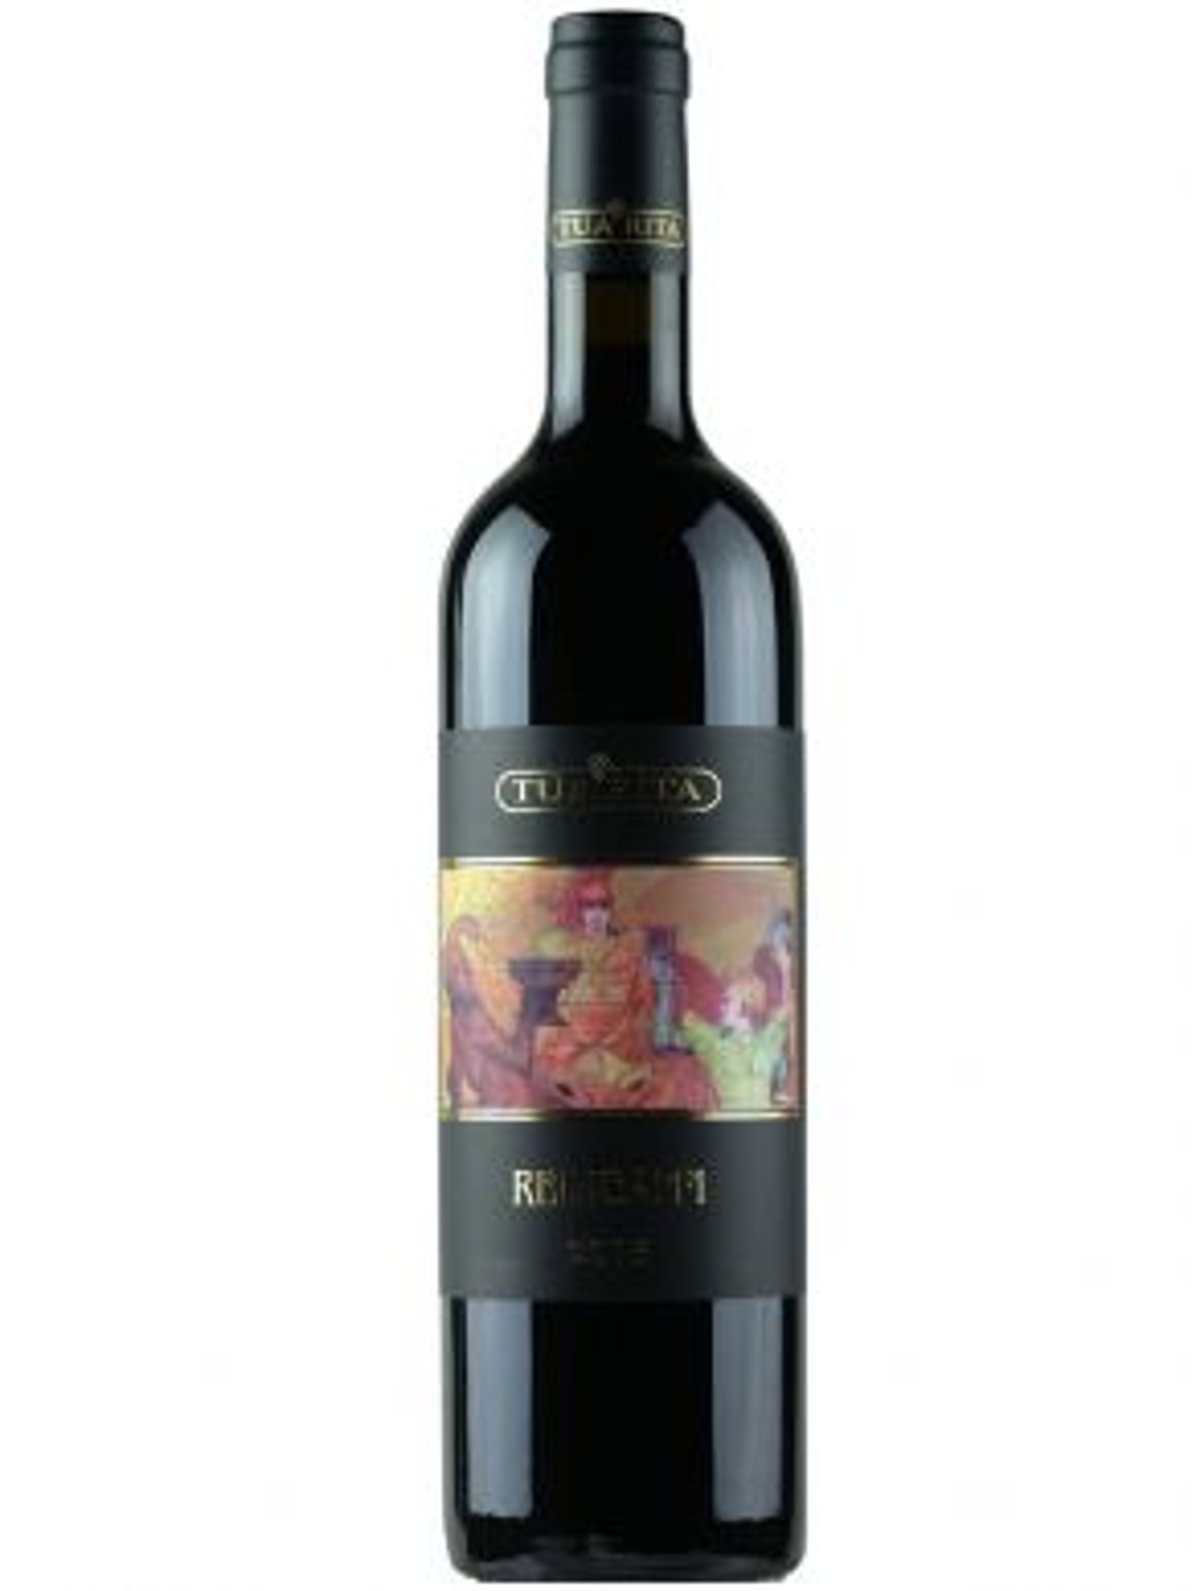 Tua Rita Redigaffi 2012 Toscana Wine Italy 75cl